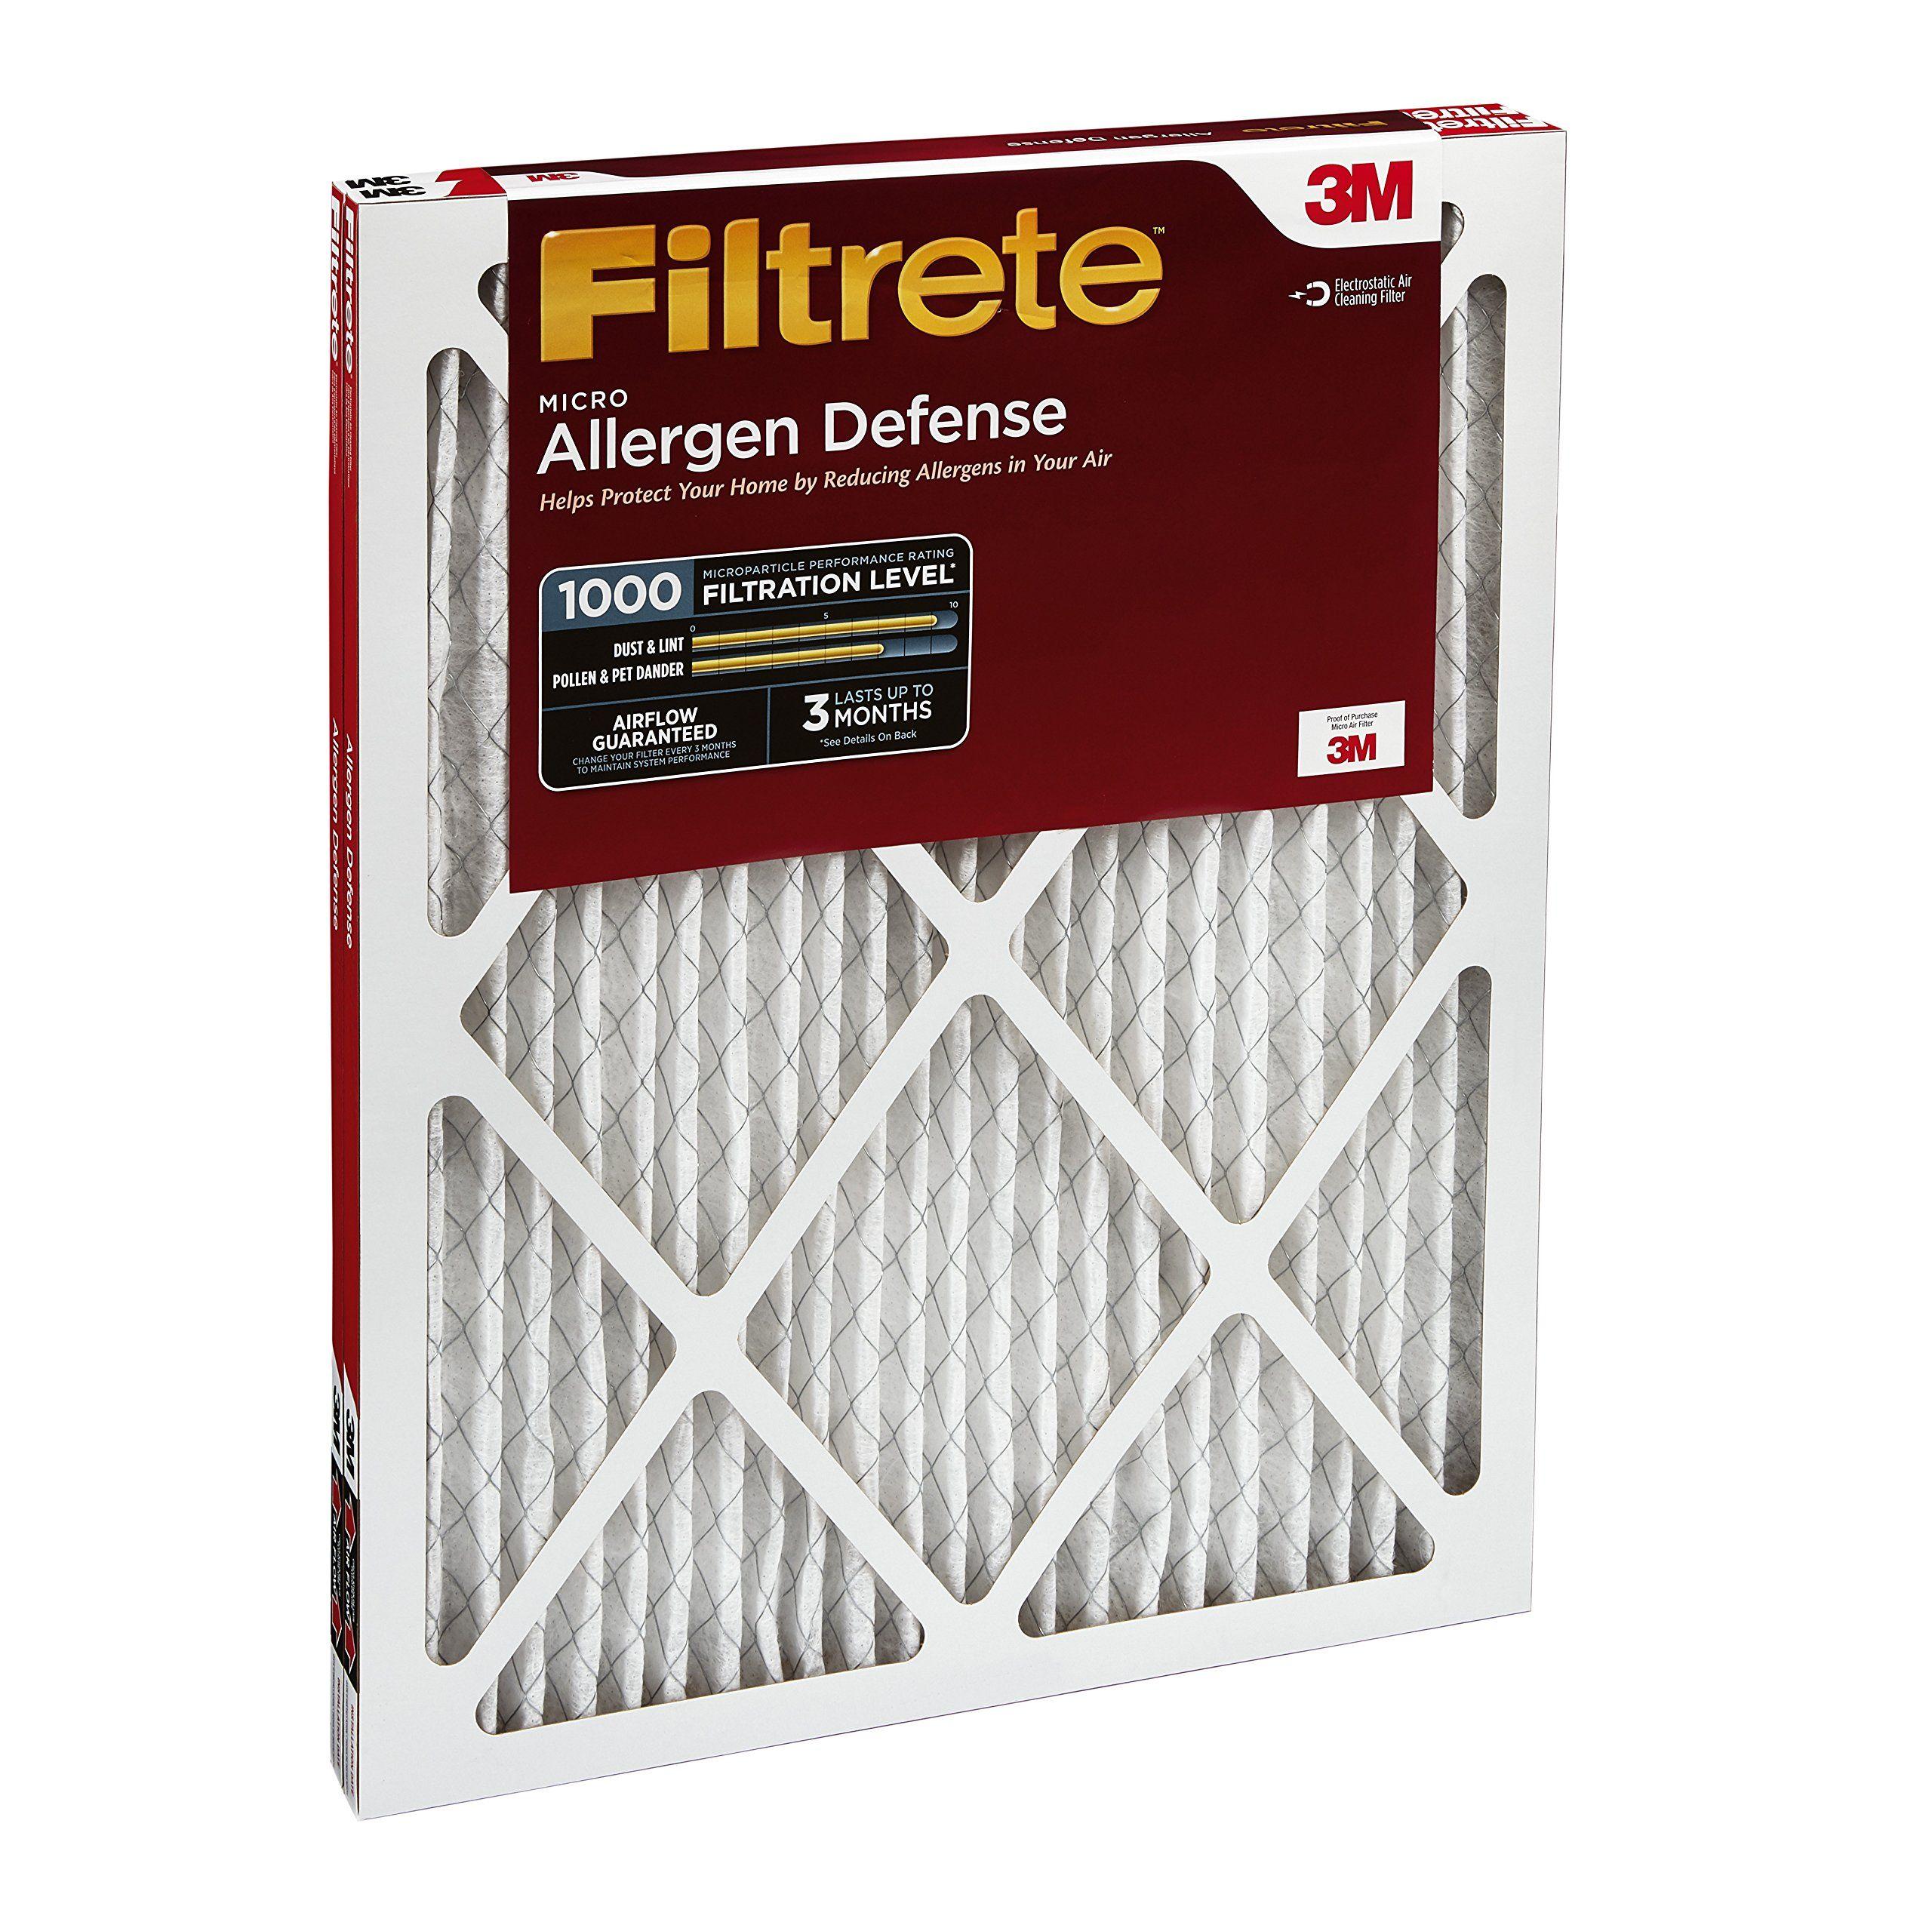 Filtrete Micro Allergen Defense AC Furnace Air Filter